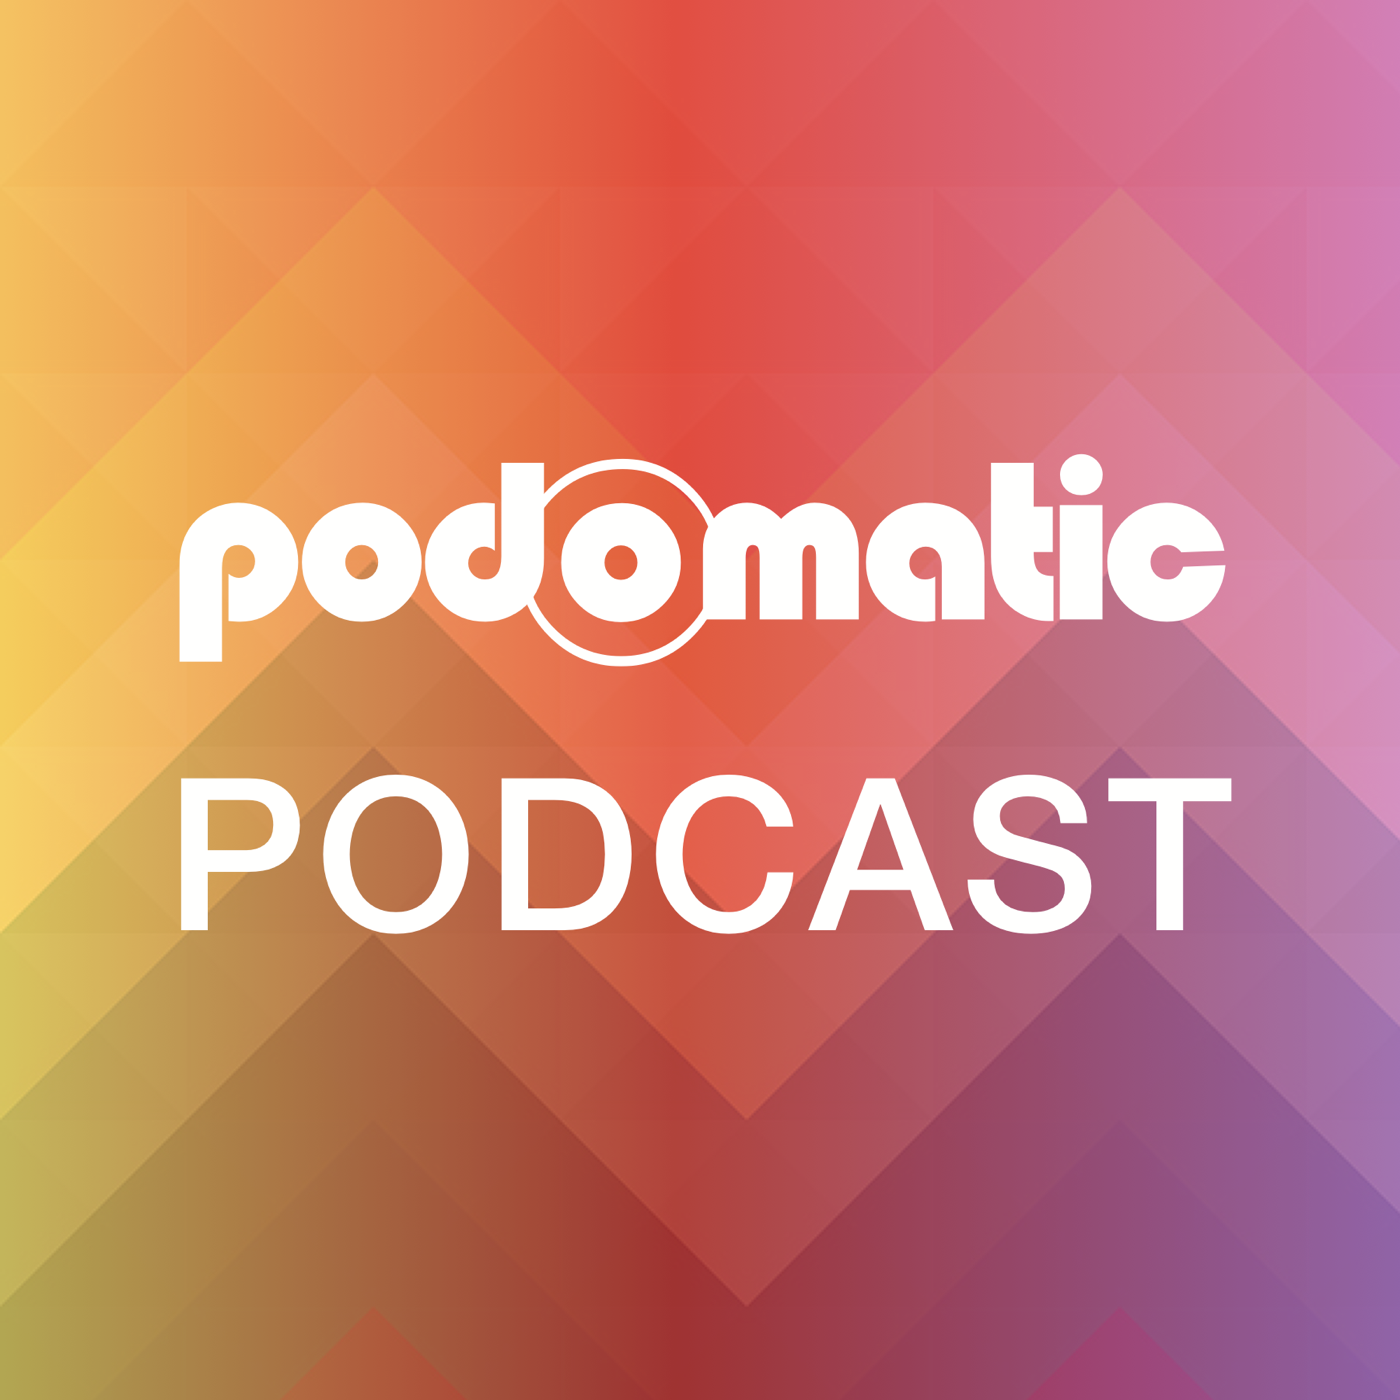 alex s' Podcast